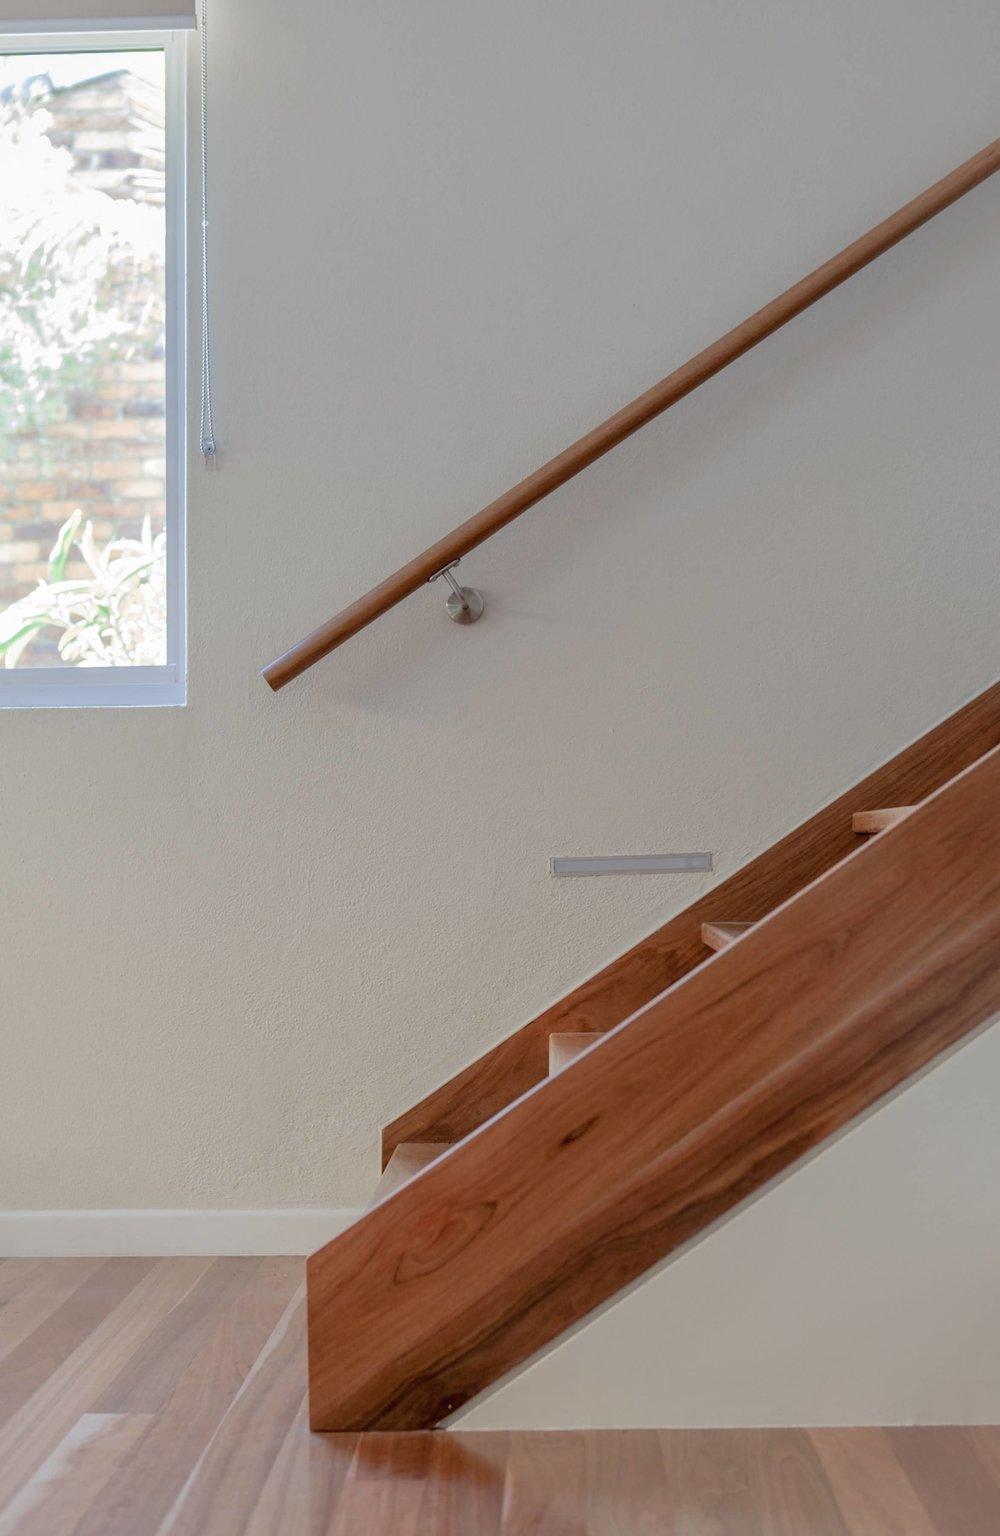 Lemm-Street-Residence-Guymer-Bailey-Architects-08.jpg